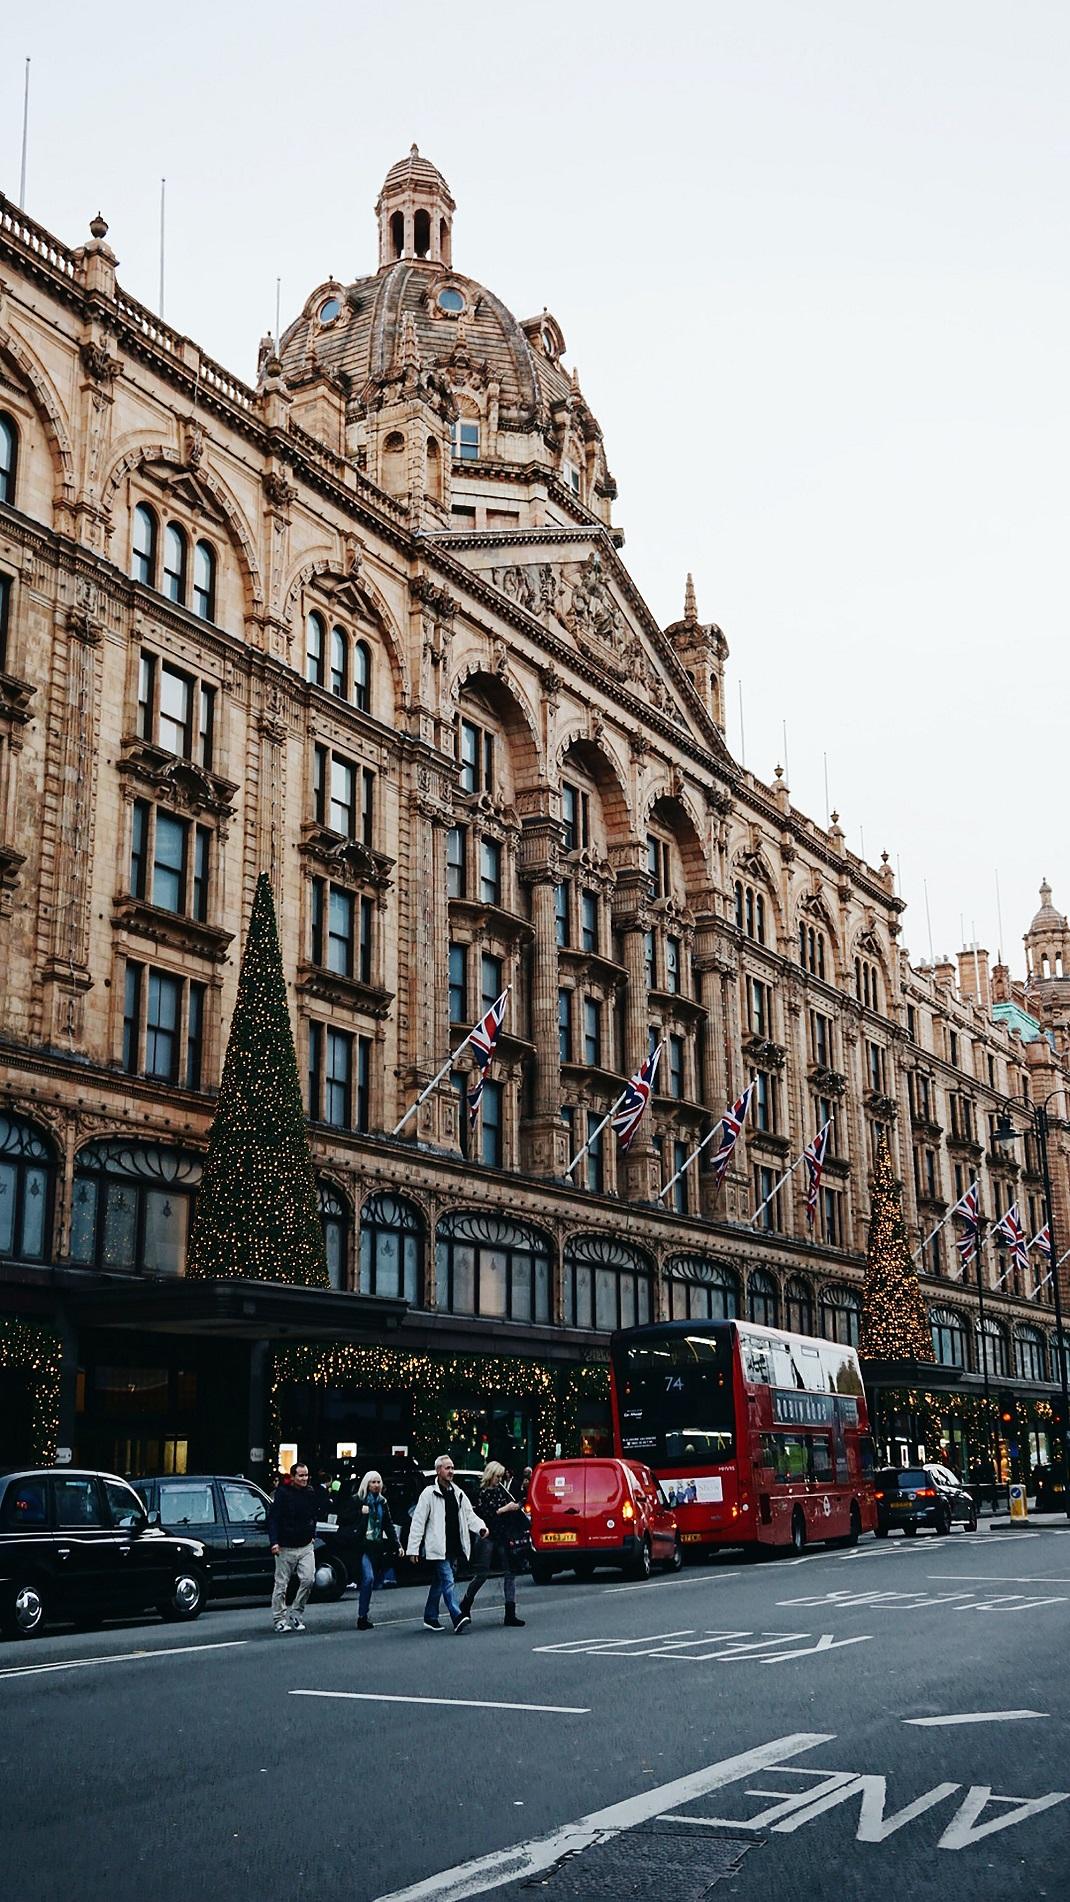 Harrods Λονδίνο Χριστούγεννα